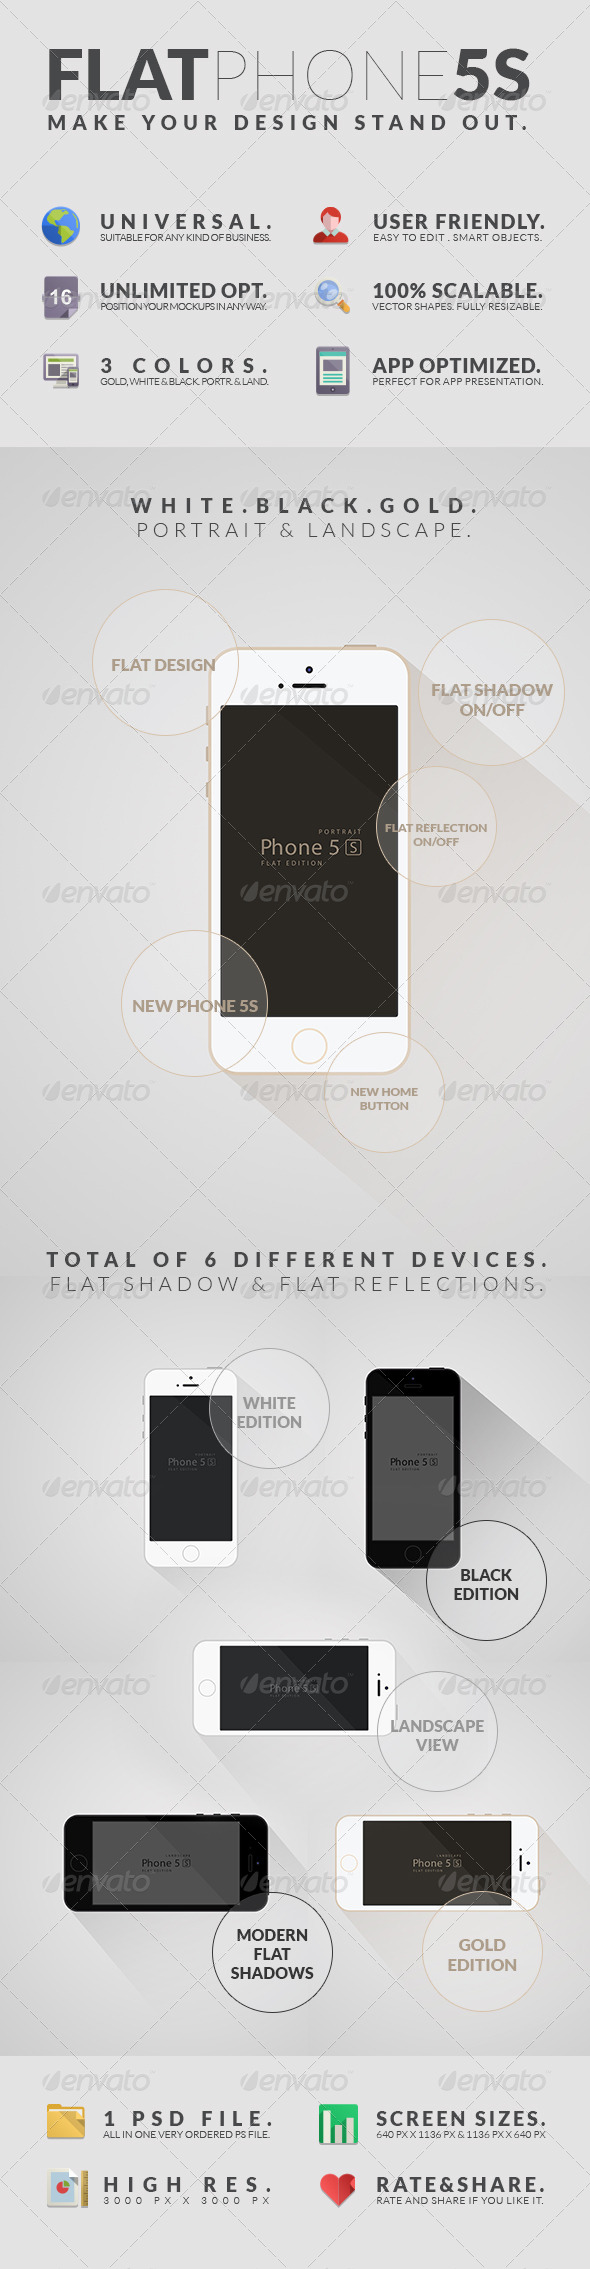 Flat Phone 5S Mockups